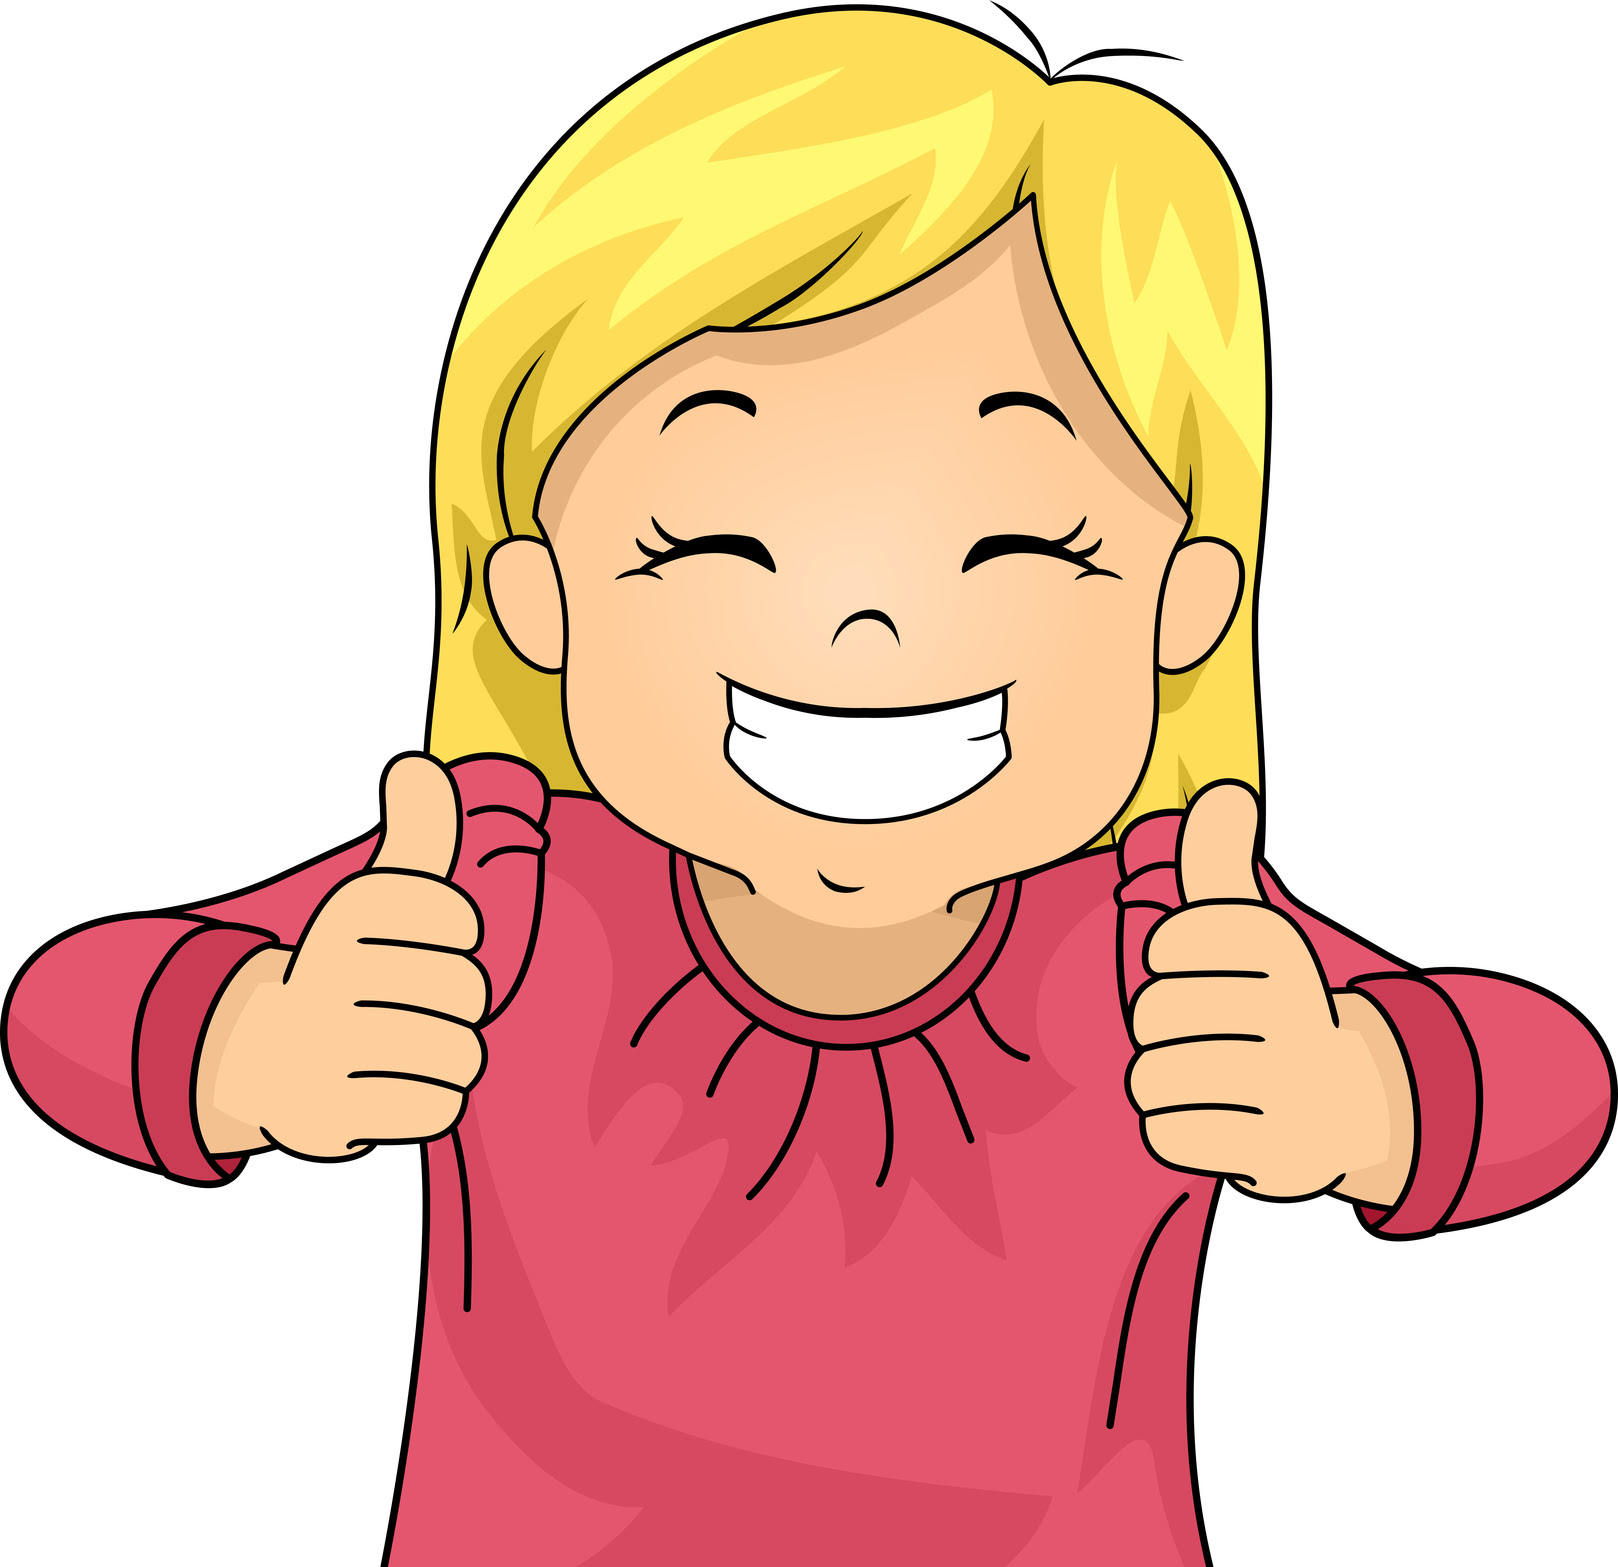 1236826_SMJPG_7TC69715M1537323M Baby girl 2 thumbs up   We ...